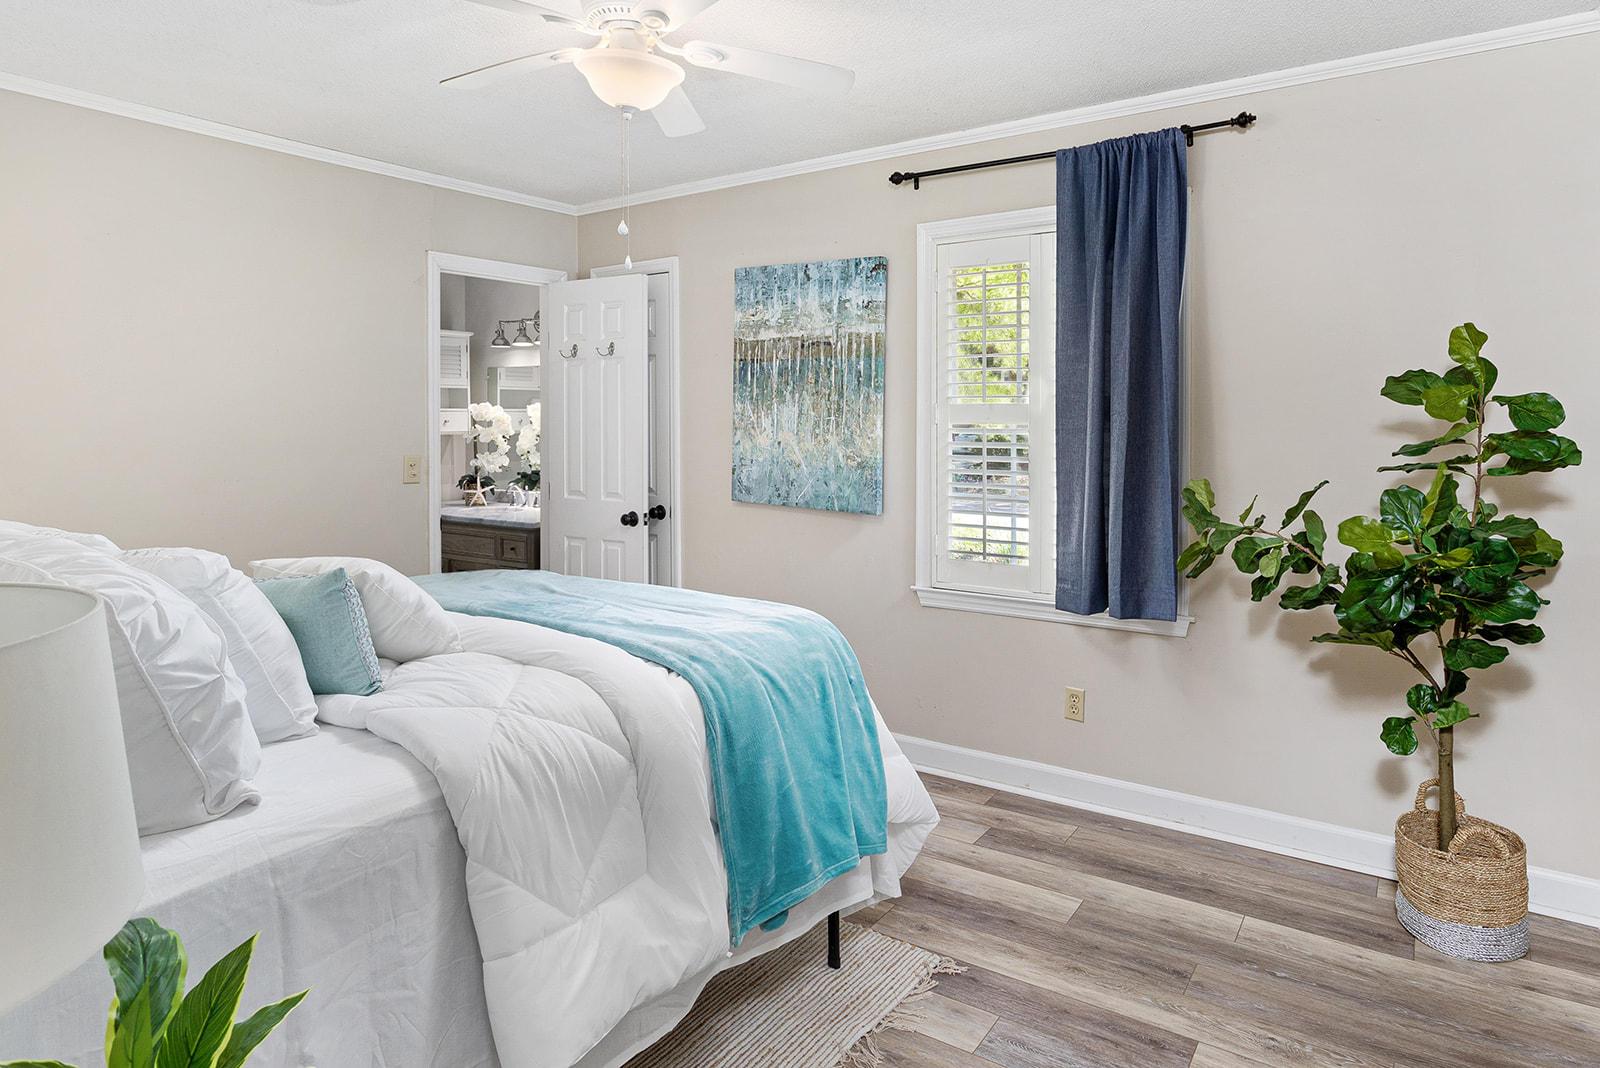 Shemwood II Homes For Sale - 954 Sea Gull, Mount Pleasant, SC - 12